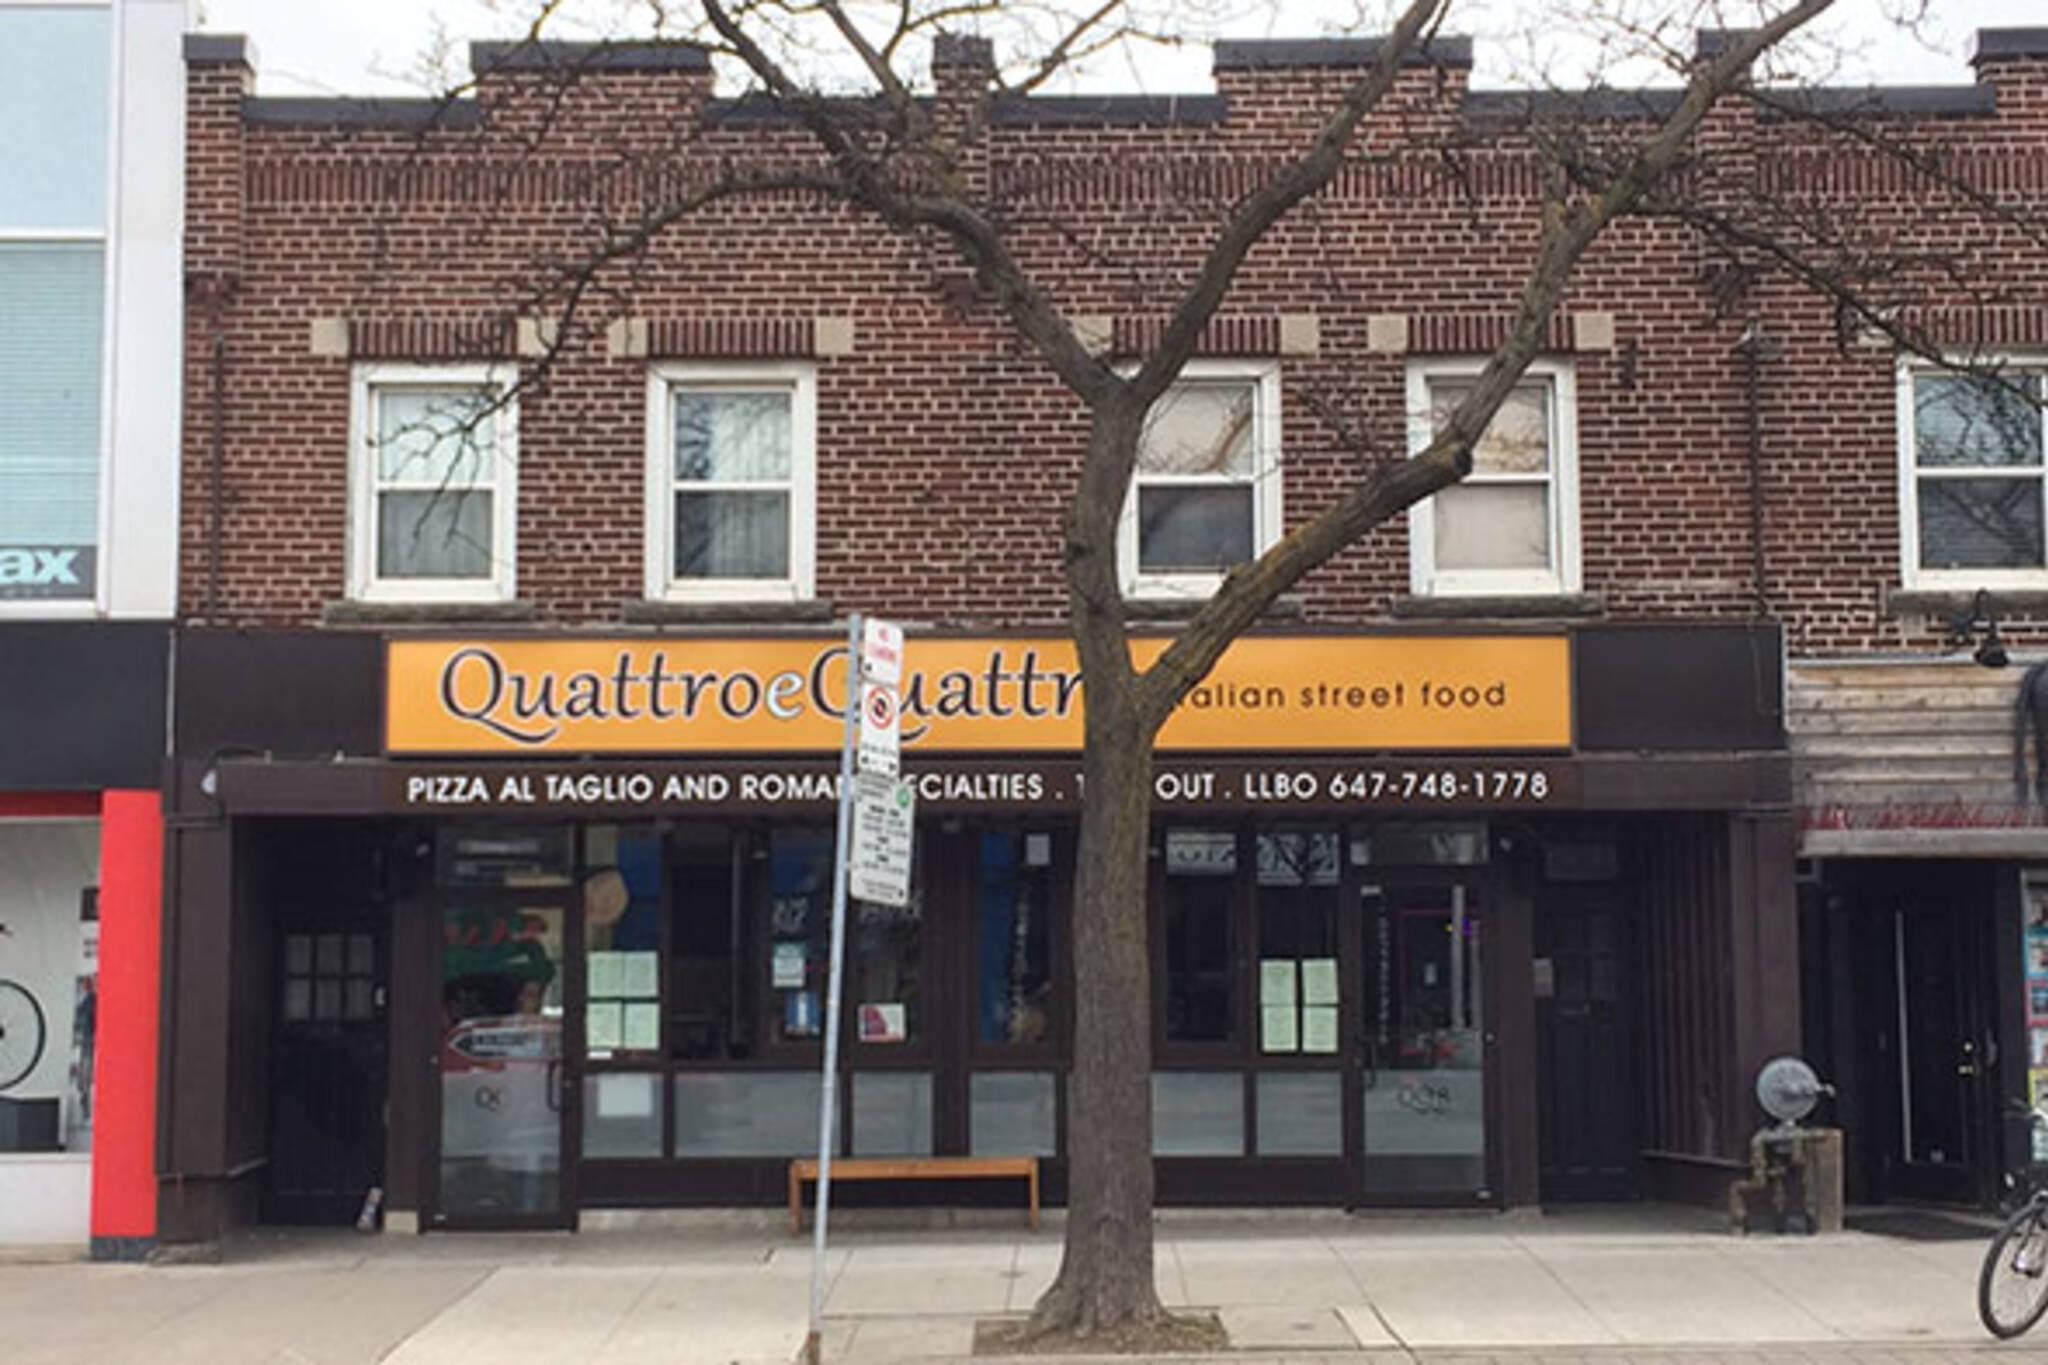 Quattro e Quattr8